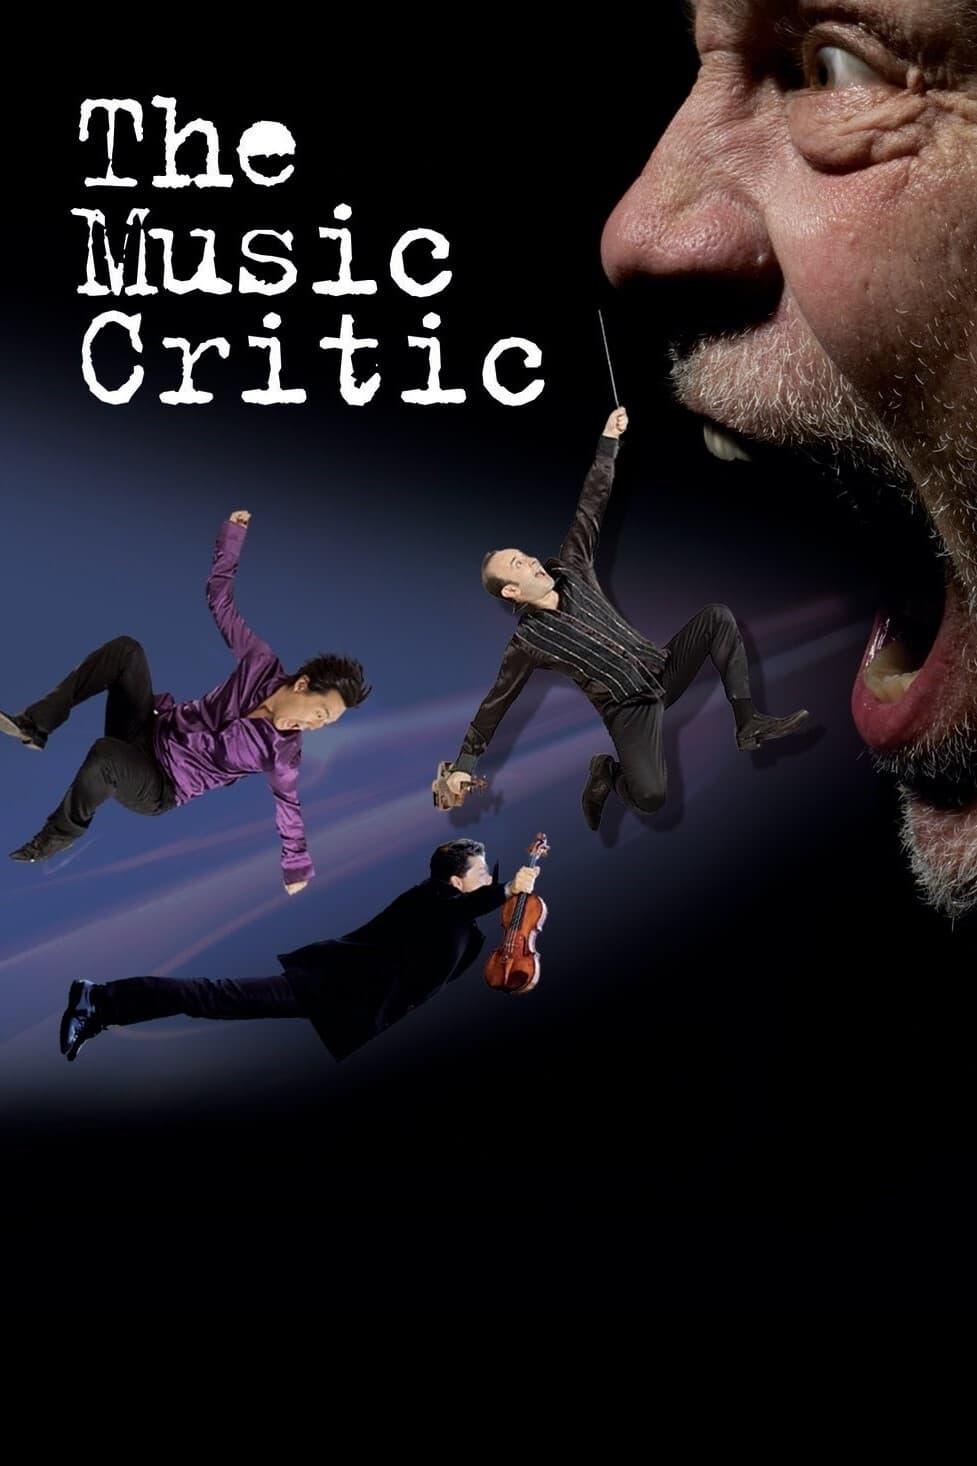 The Music Critic